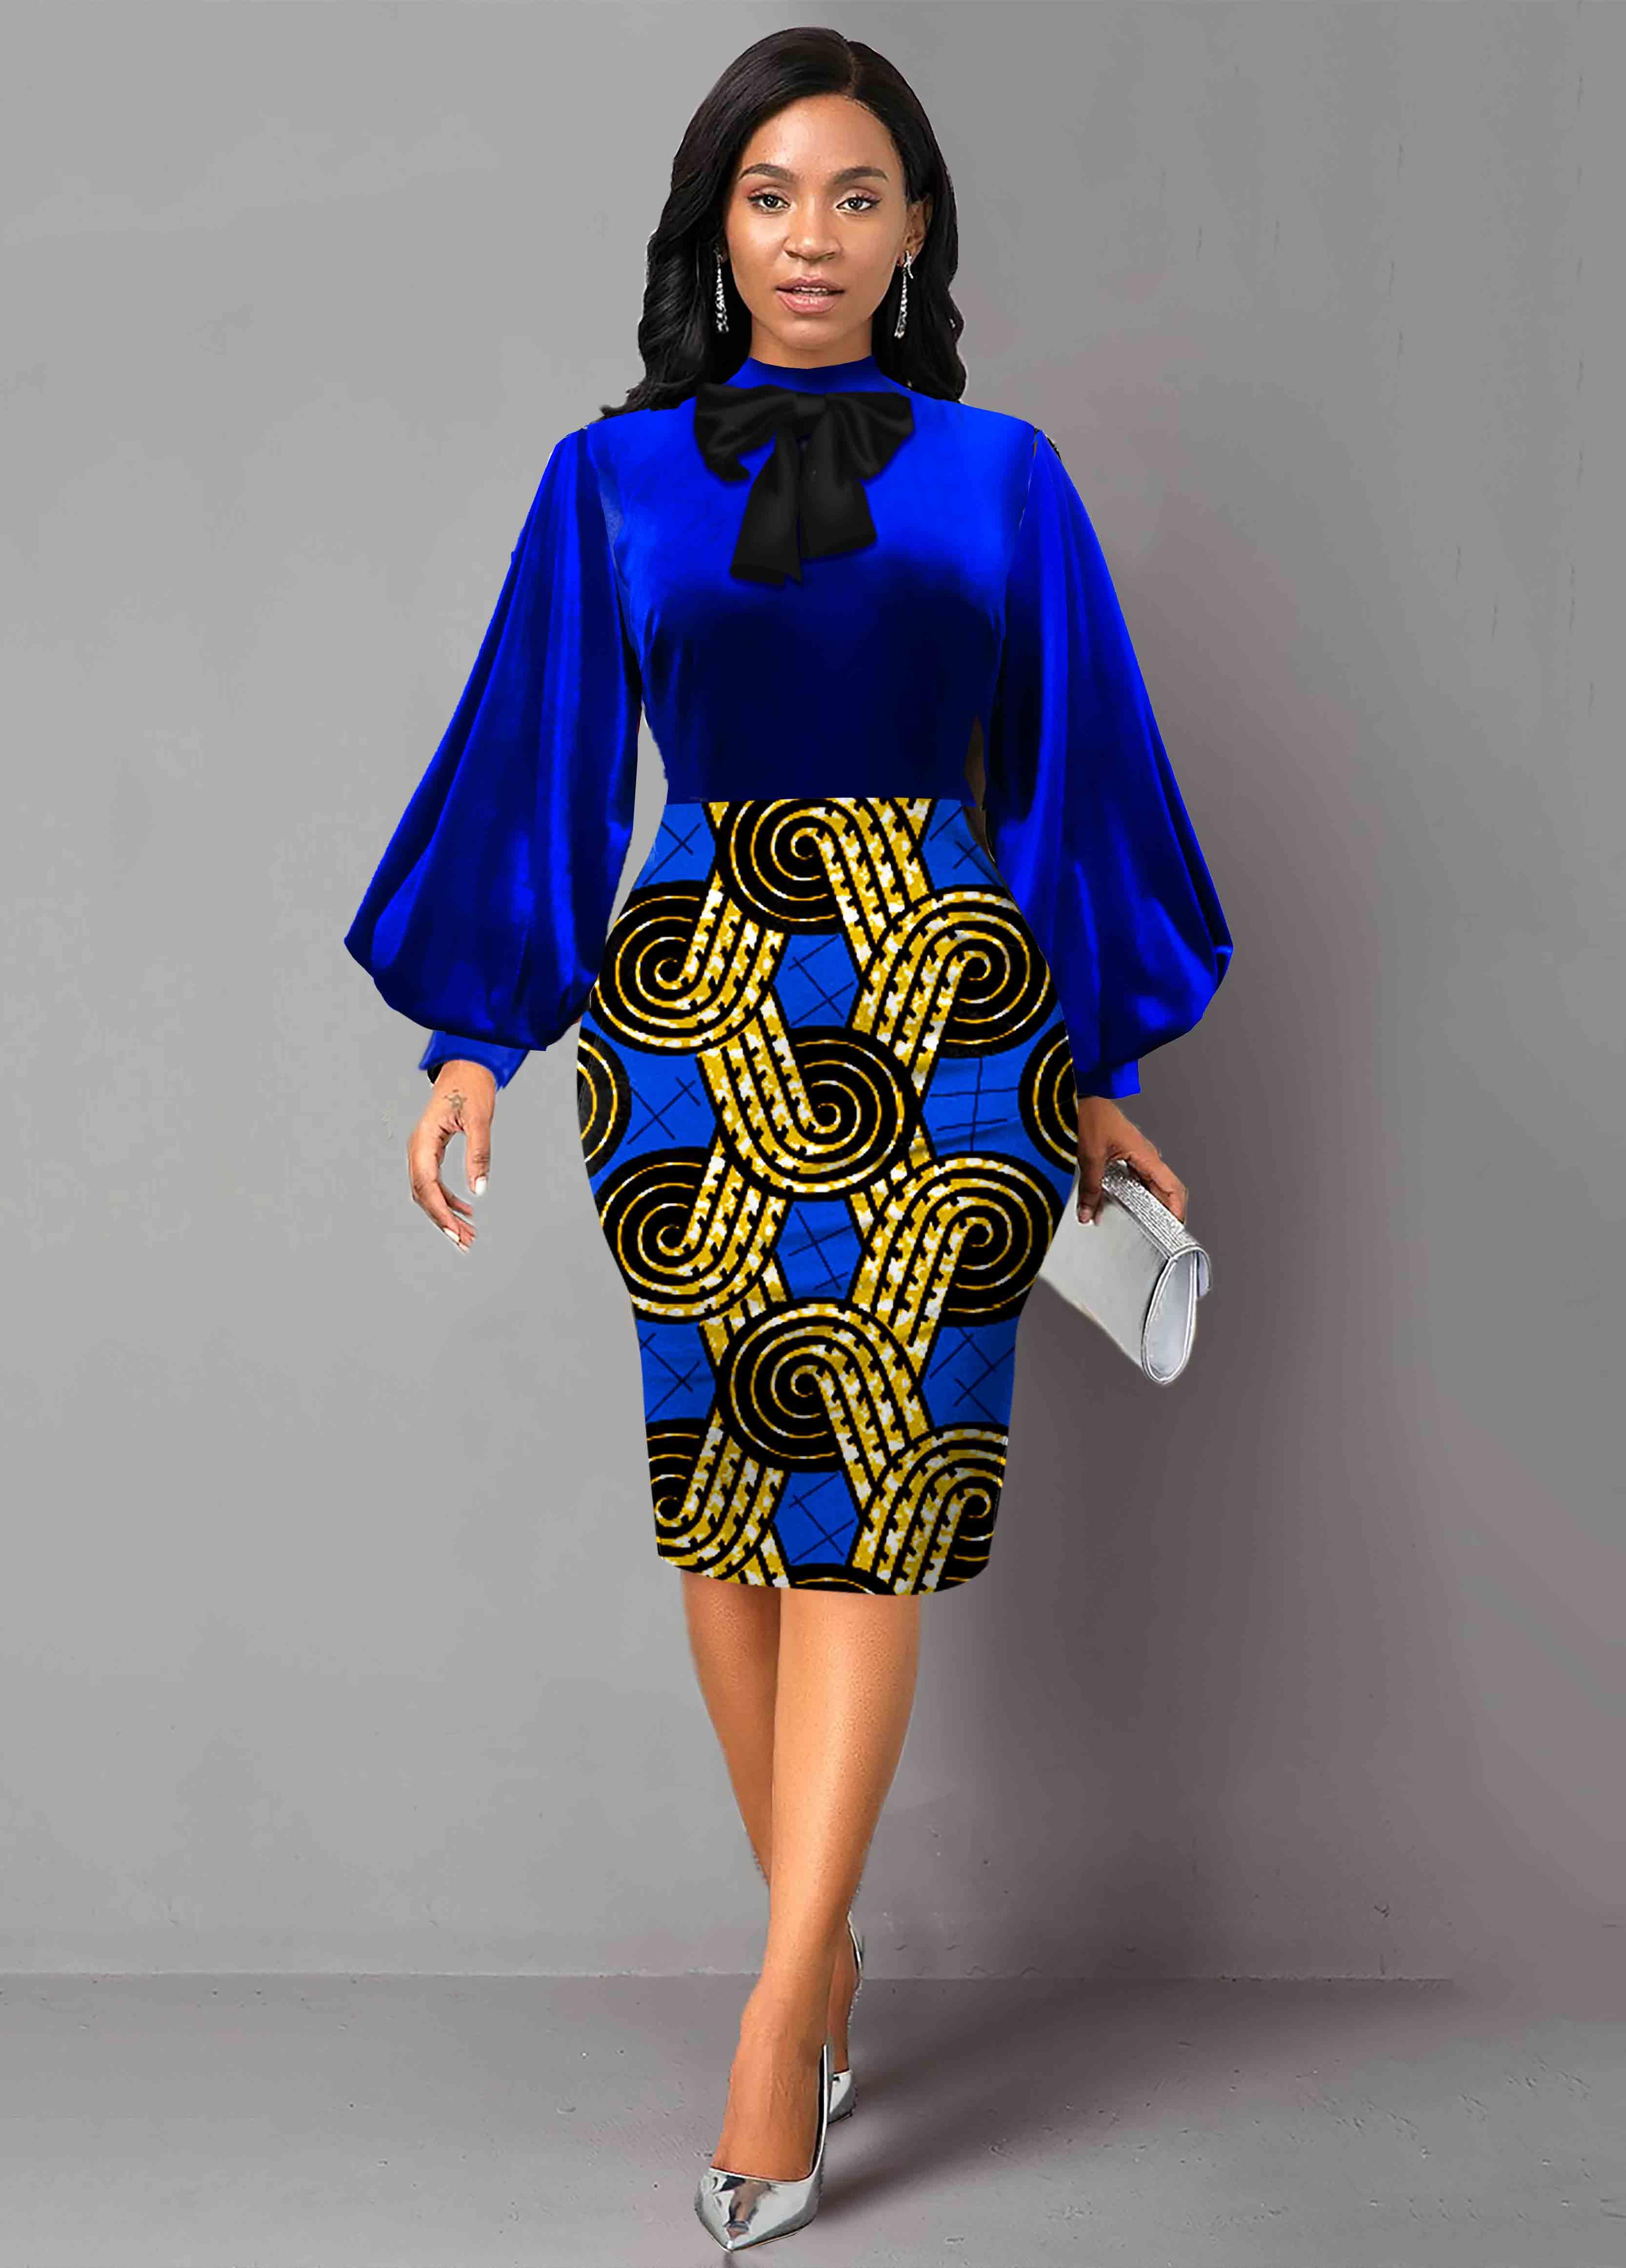 ROTITA Geometric Print Bowknot Lantern Sleeve Velvet Dress